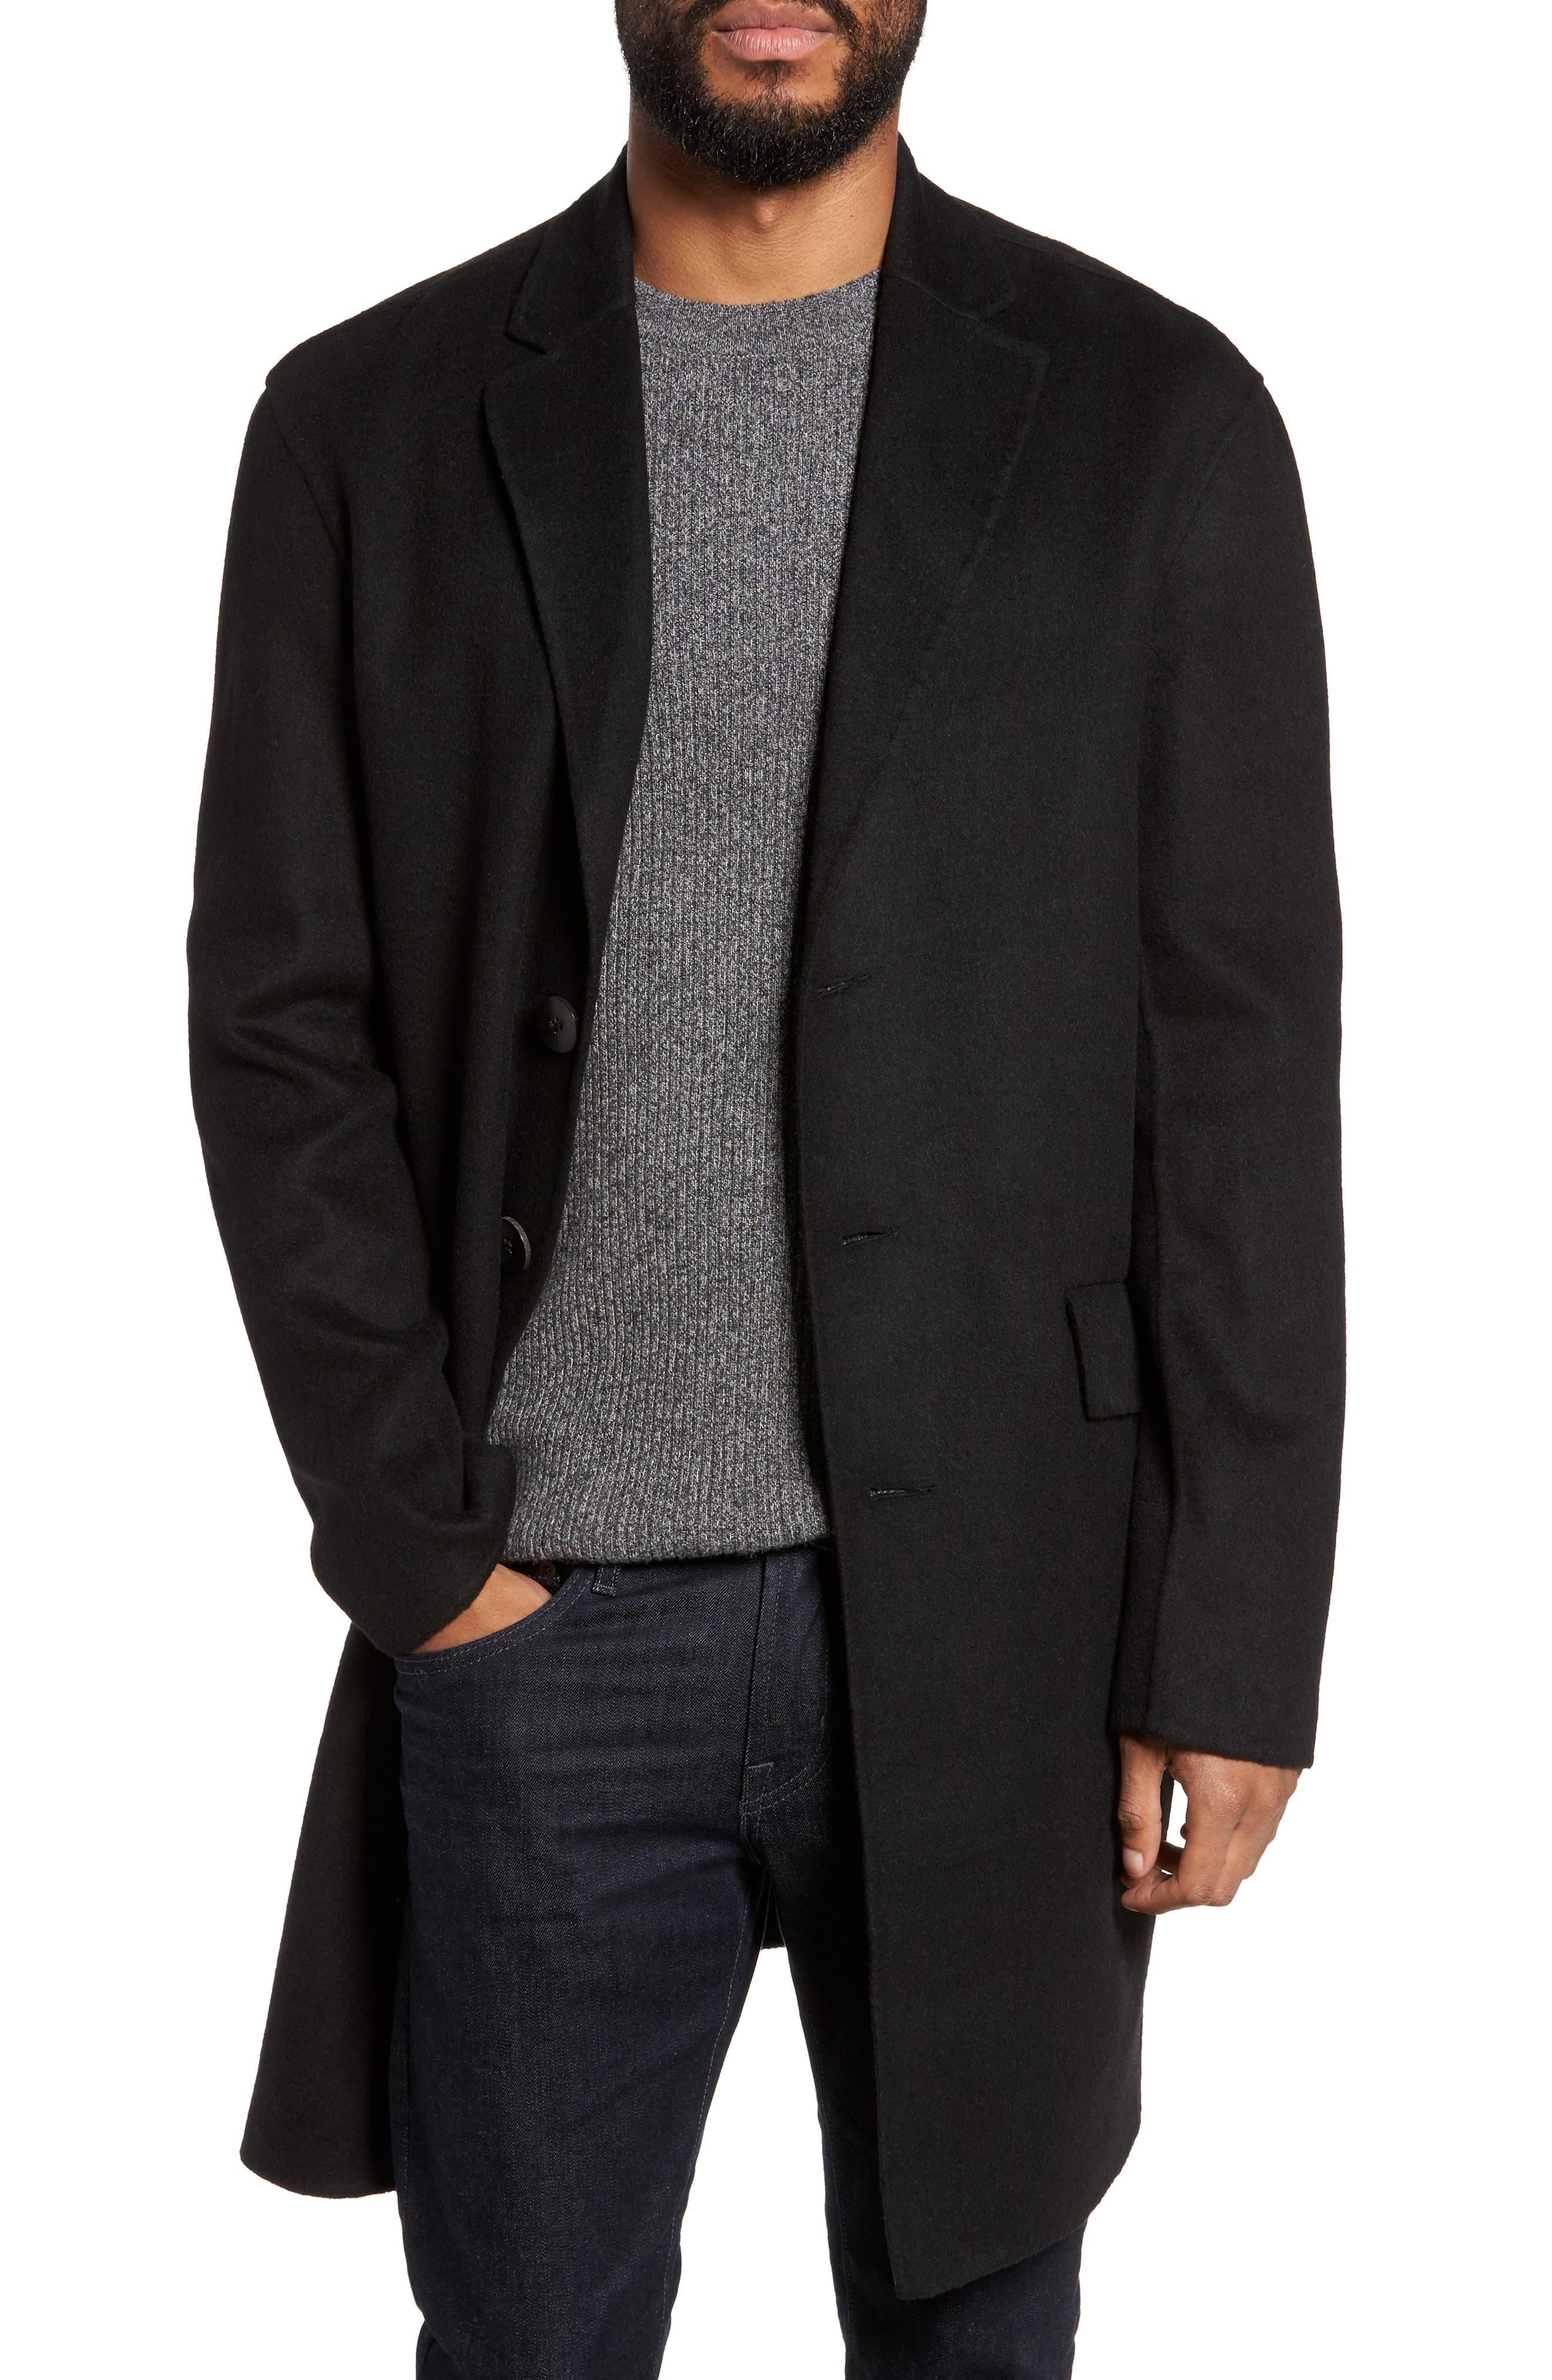 Alternate Image 1 Selected - LAMARQUE Wool Blend Topcoat